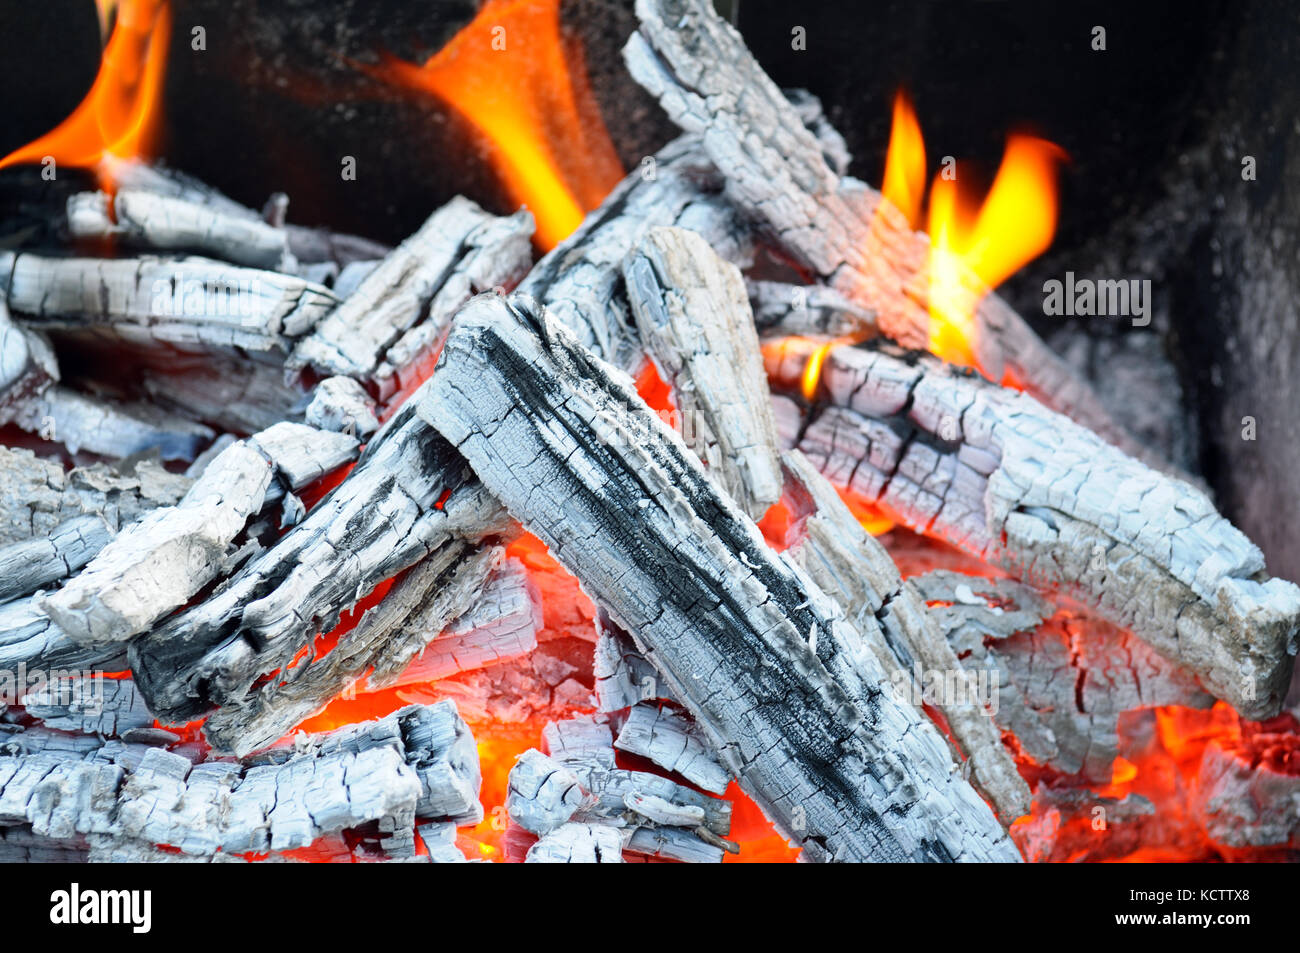 ash wood charcoal stock photos u0026 ash wood charcoal stock images